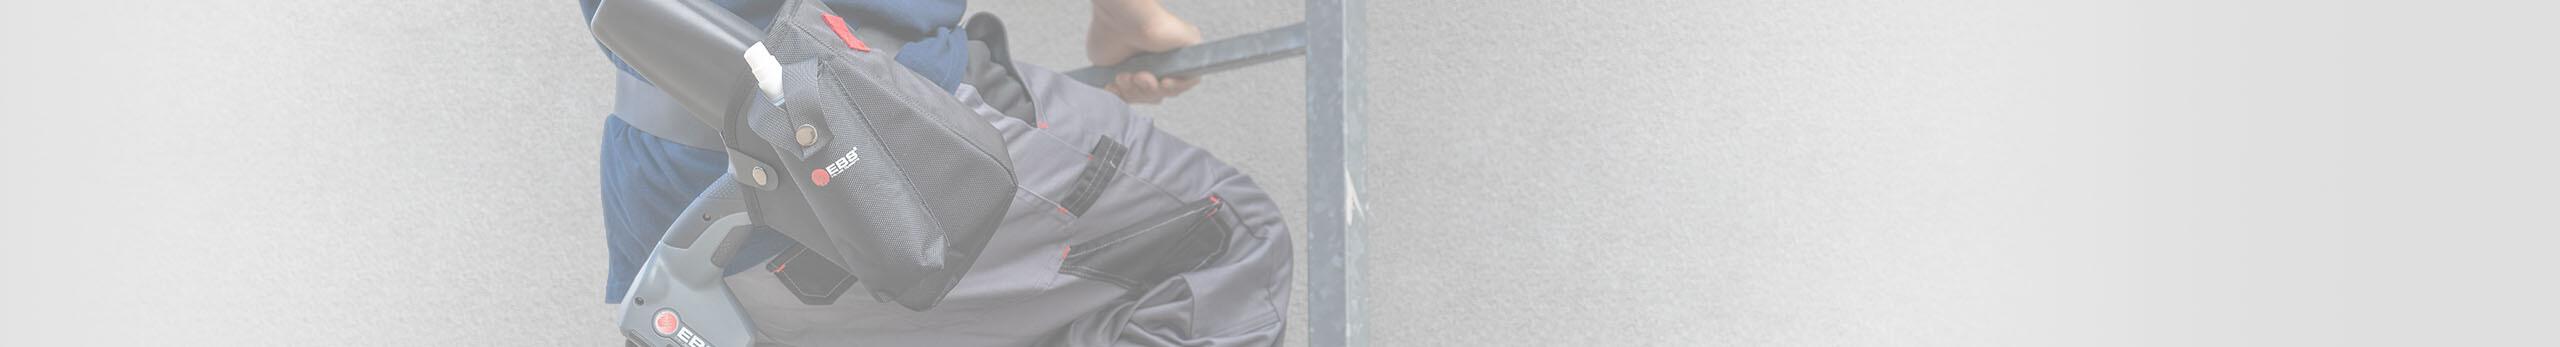 Kabura z pasem na biodro - kabura kabura website pasek tło